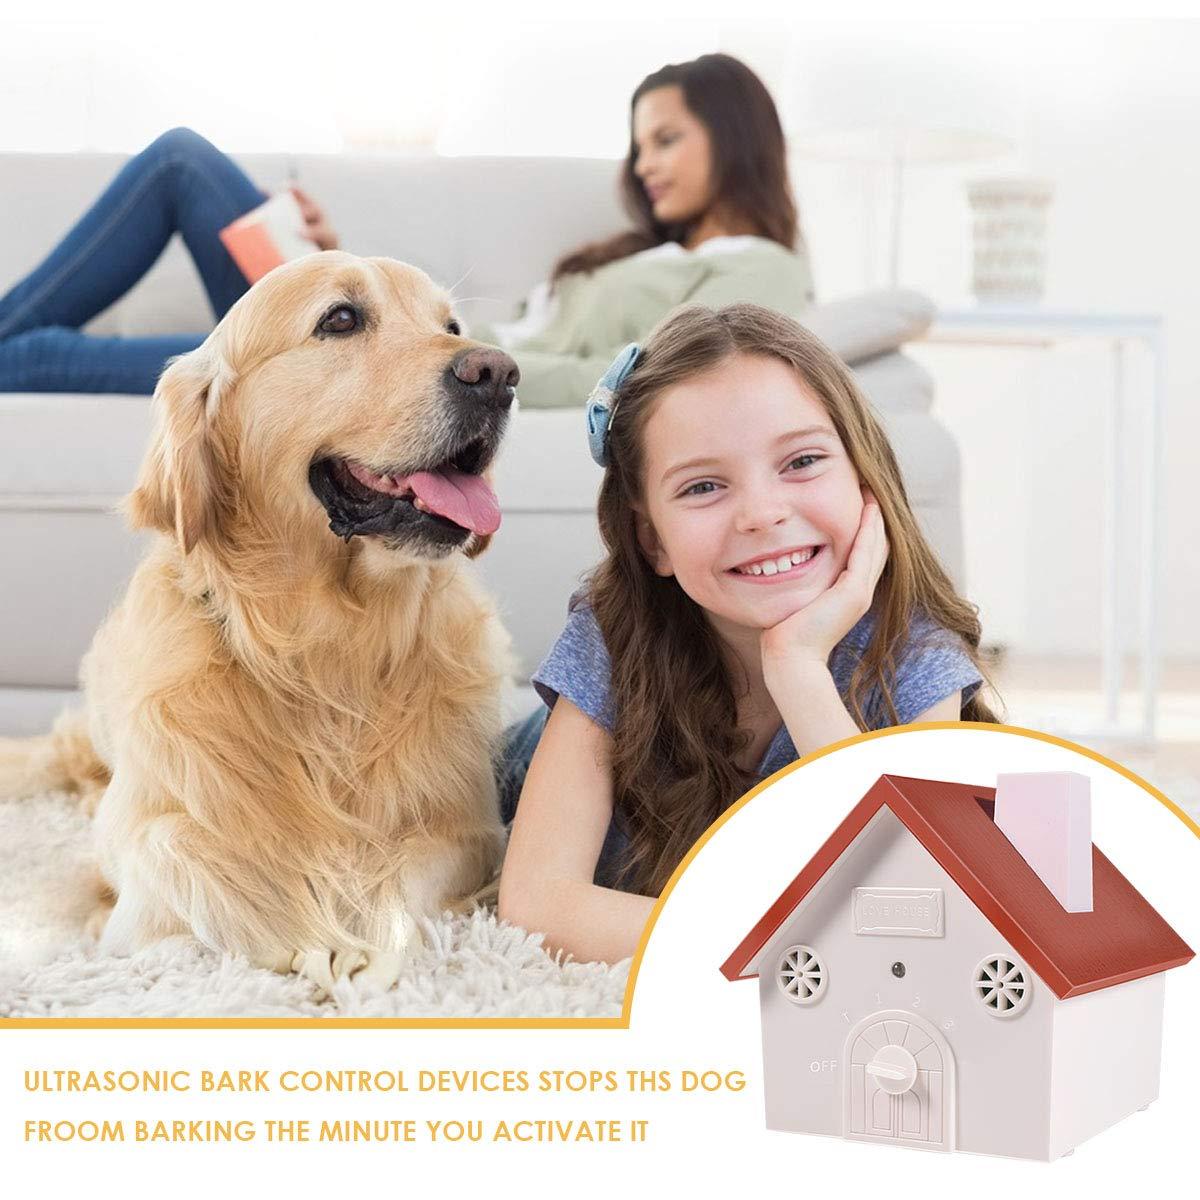 Stop Barking Dog Device,100/% Harmless Ultrasonic Bark Control and Waterproof Stop Dog Barking Device,Indoor Outdoor Hidden Anti-Barking Device Clever sprouts Ultrasonic Anti Barking Device